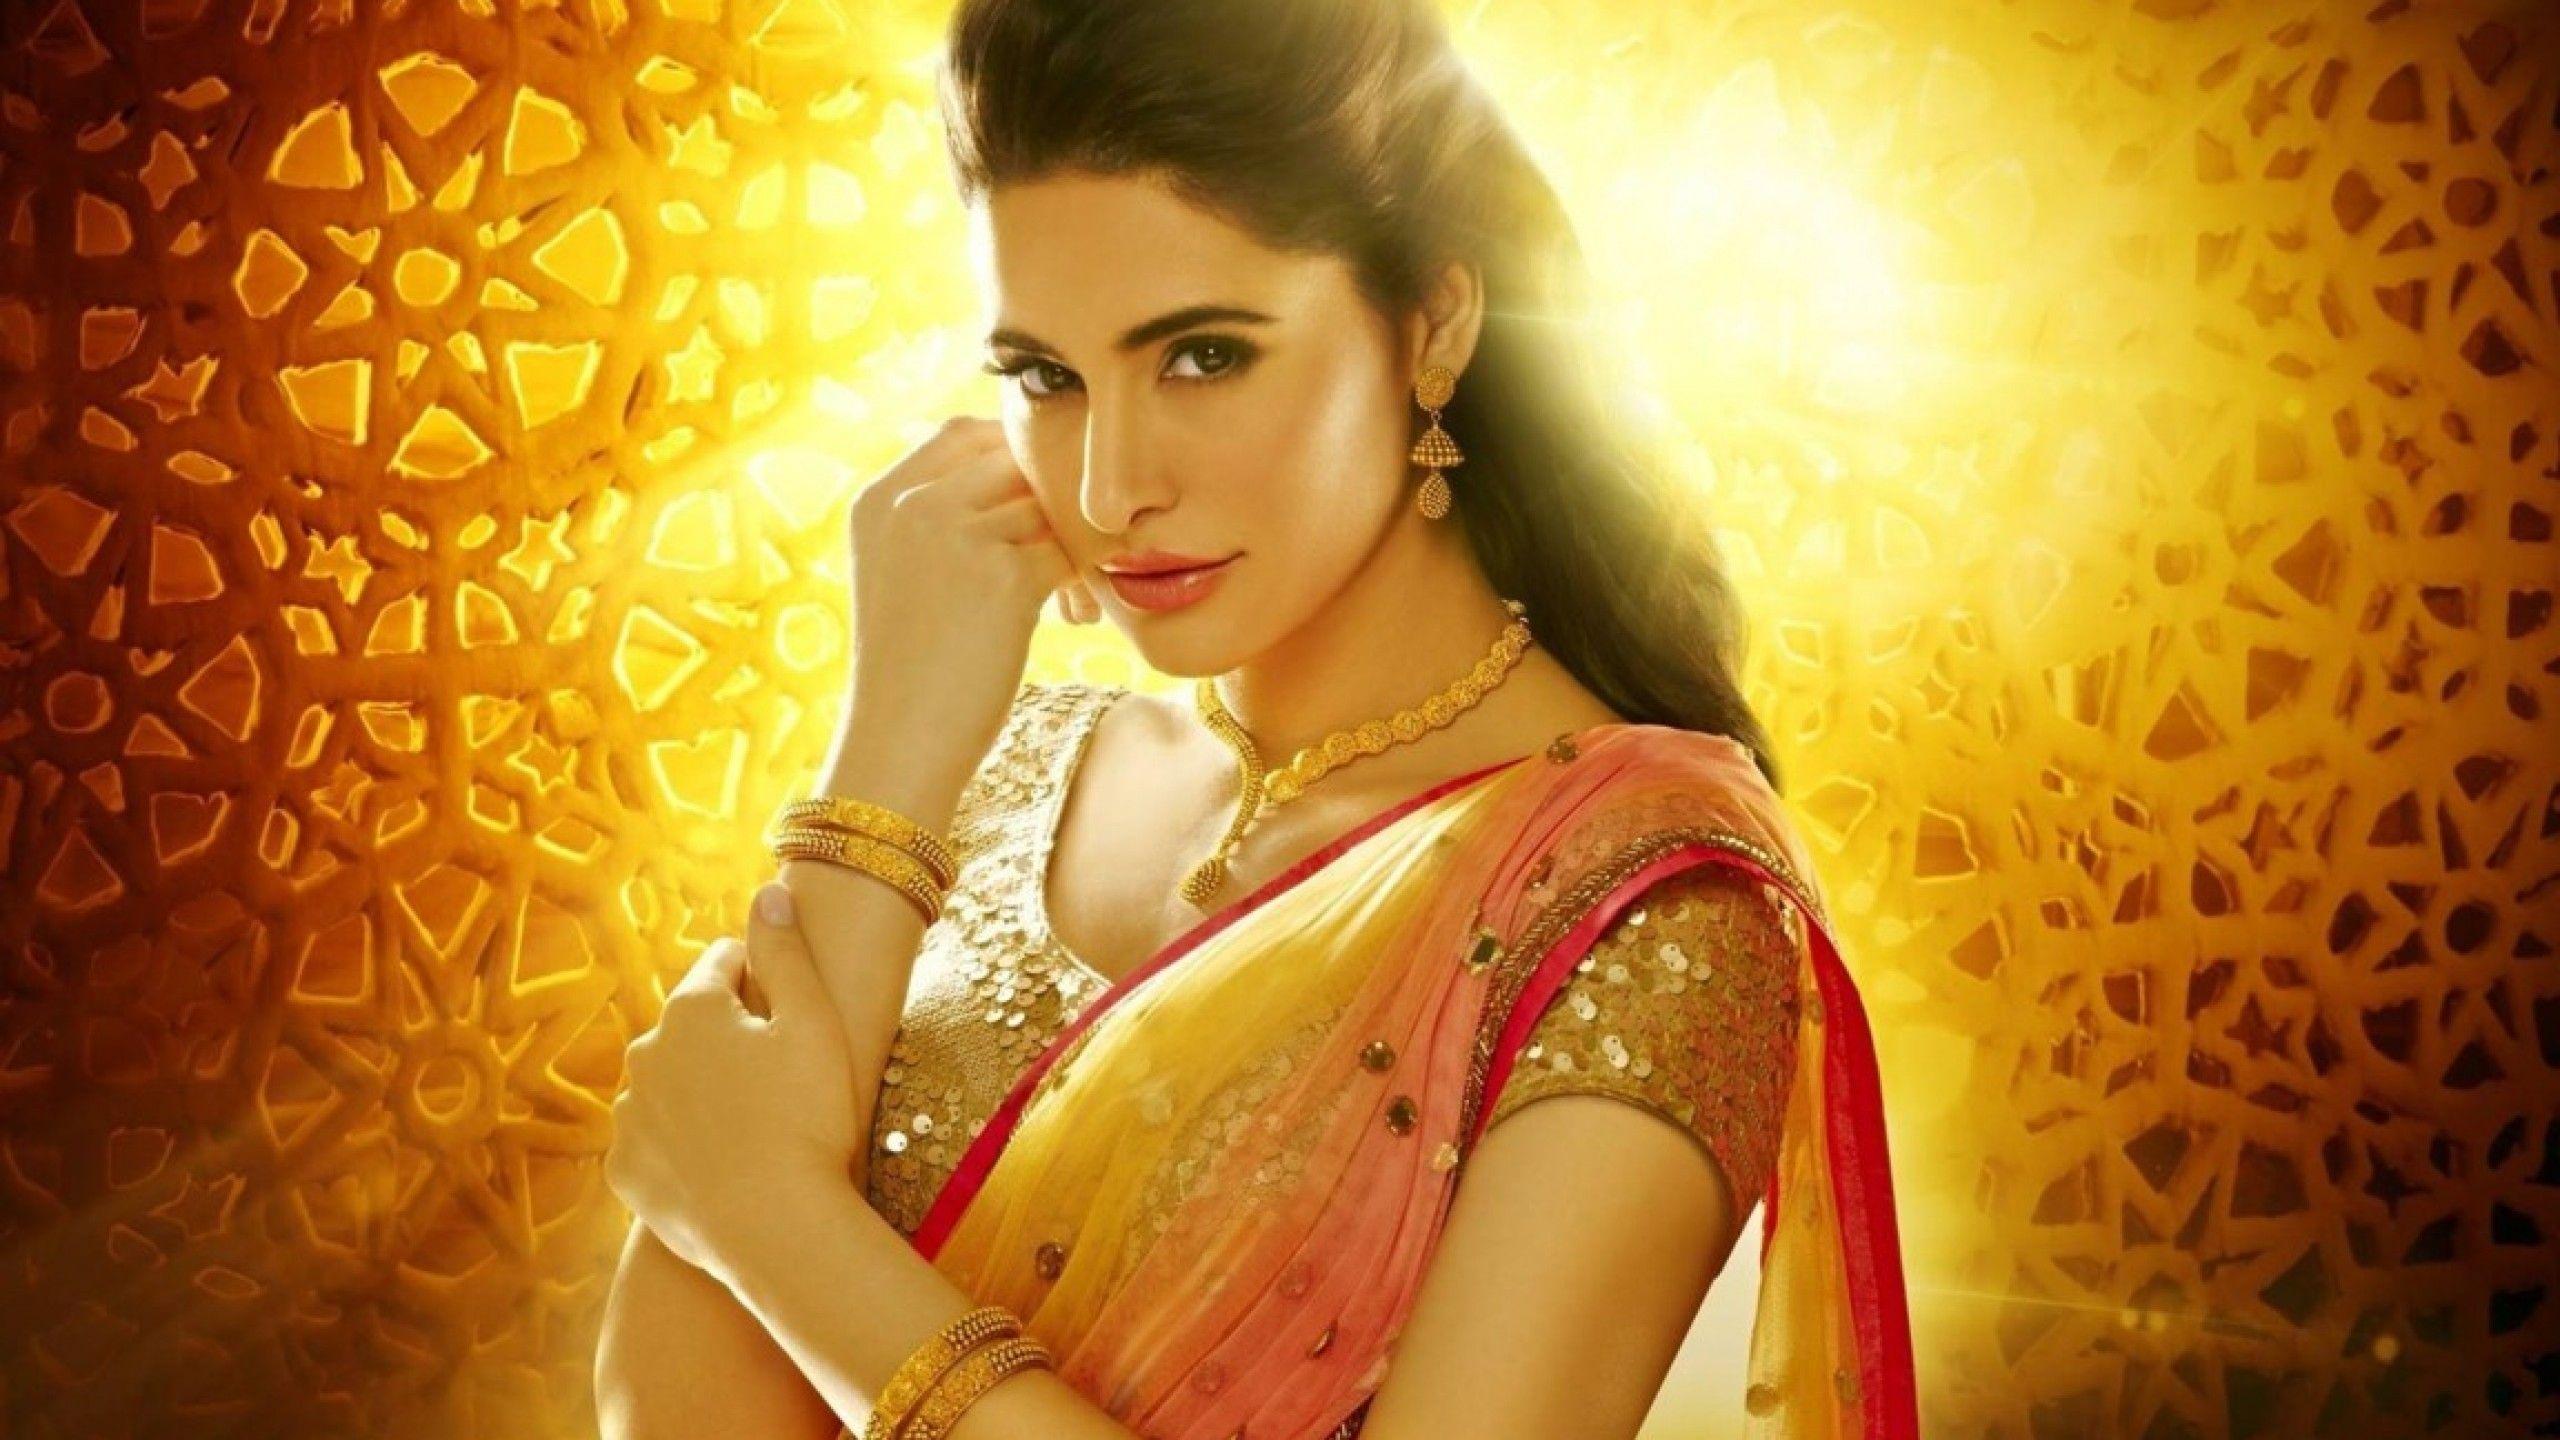 Nargis Fakri Hollywood Actress Wallpapers Download FREE Page